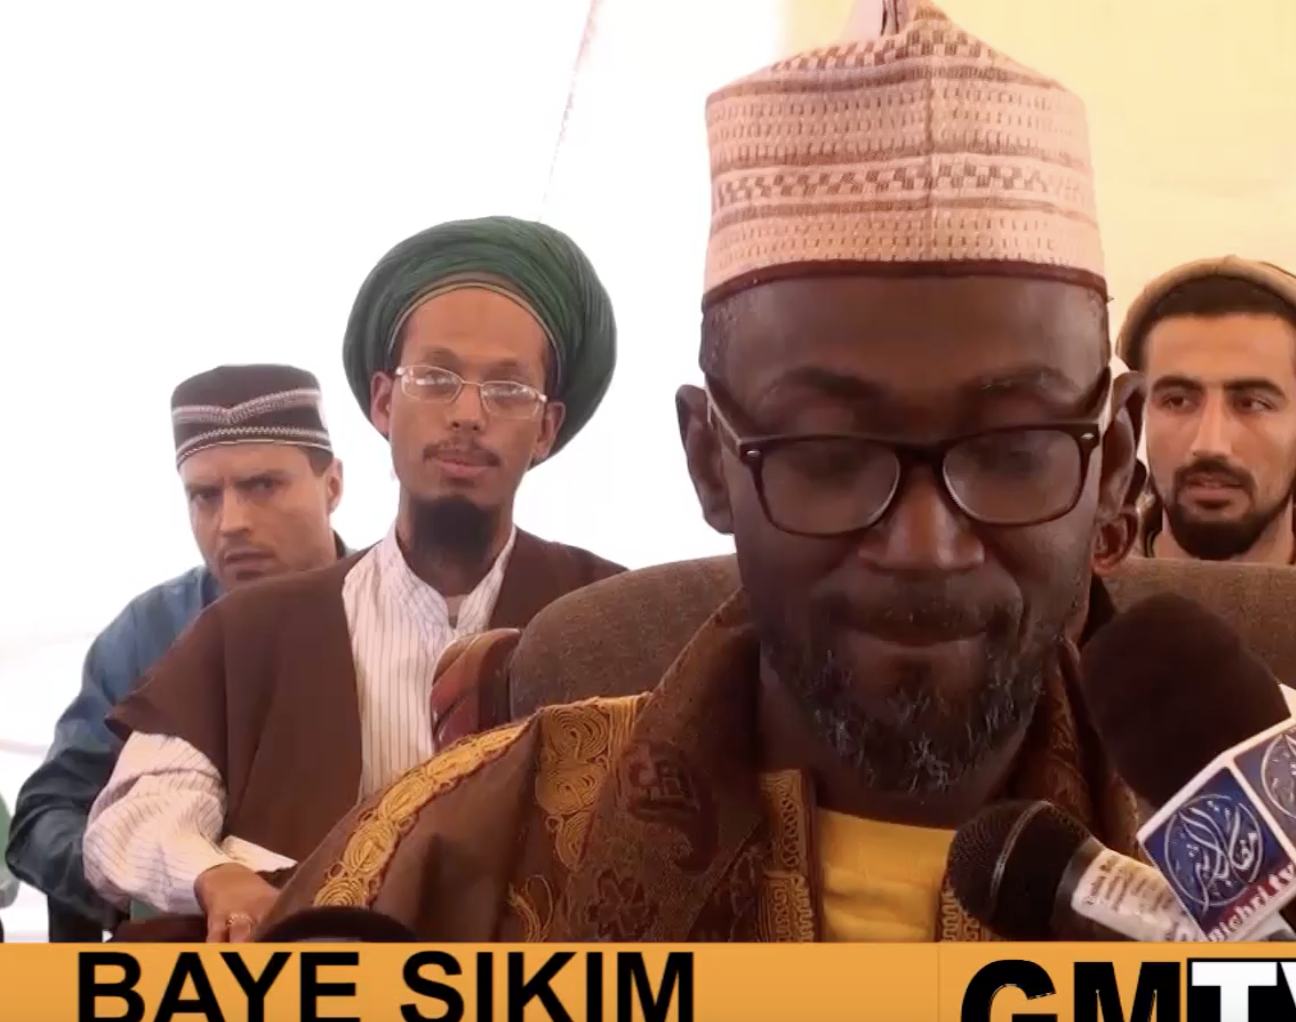 VIDEO - L'Américain Baye Sikim parle de Serigne Touba et Elhadji Malick